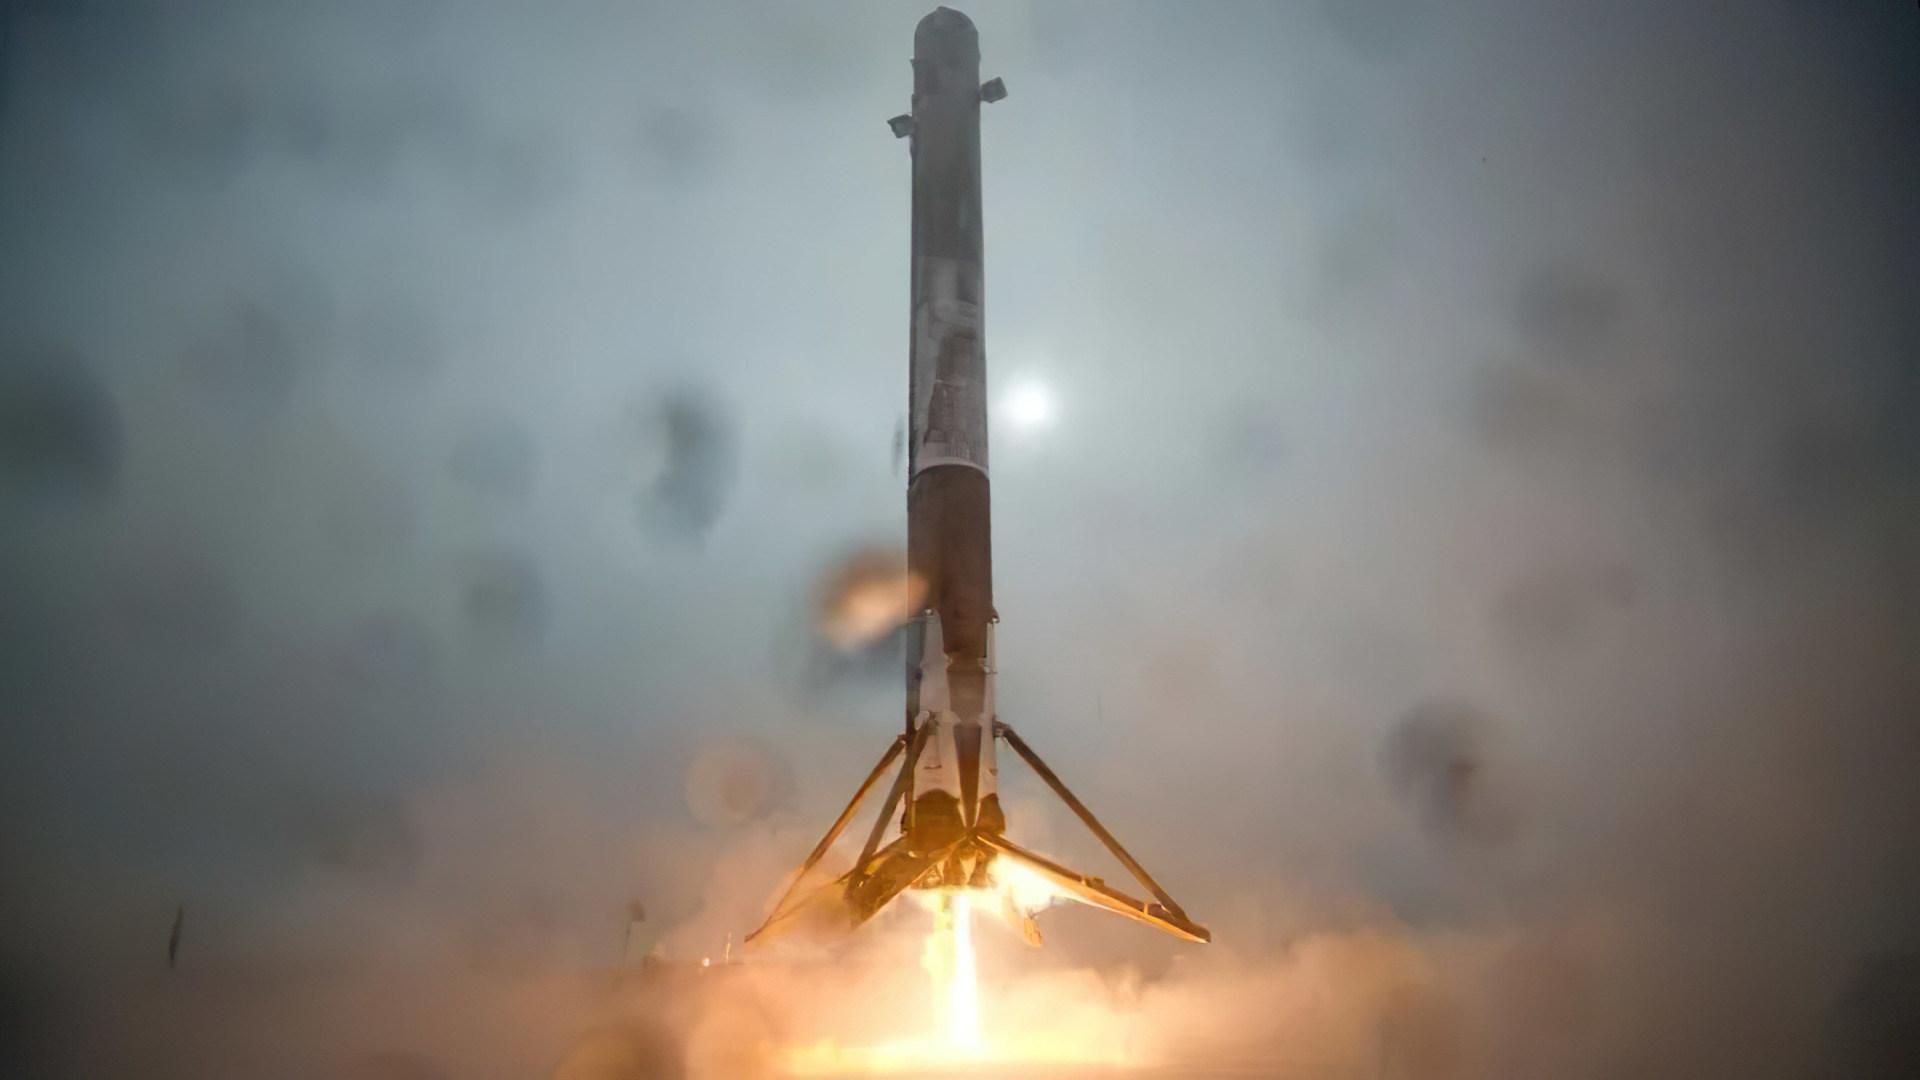 Elon Musk, Spacex, Rakete, Falcon 9, Landung